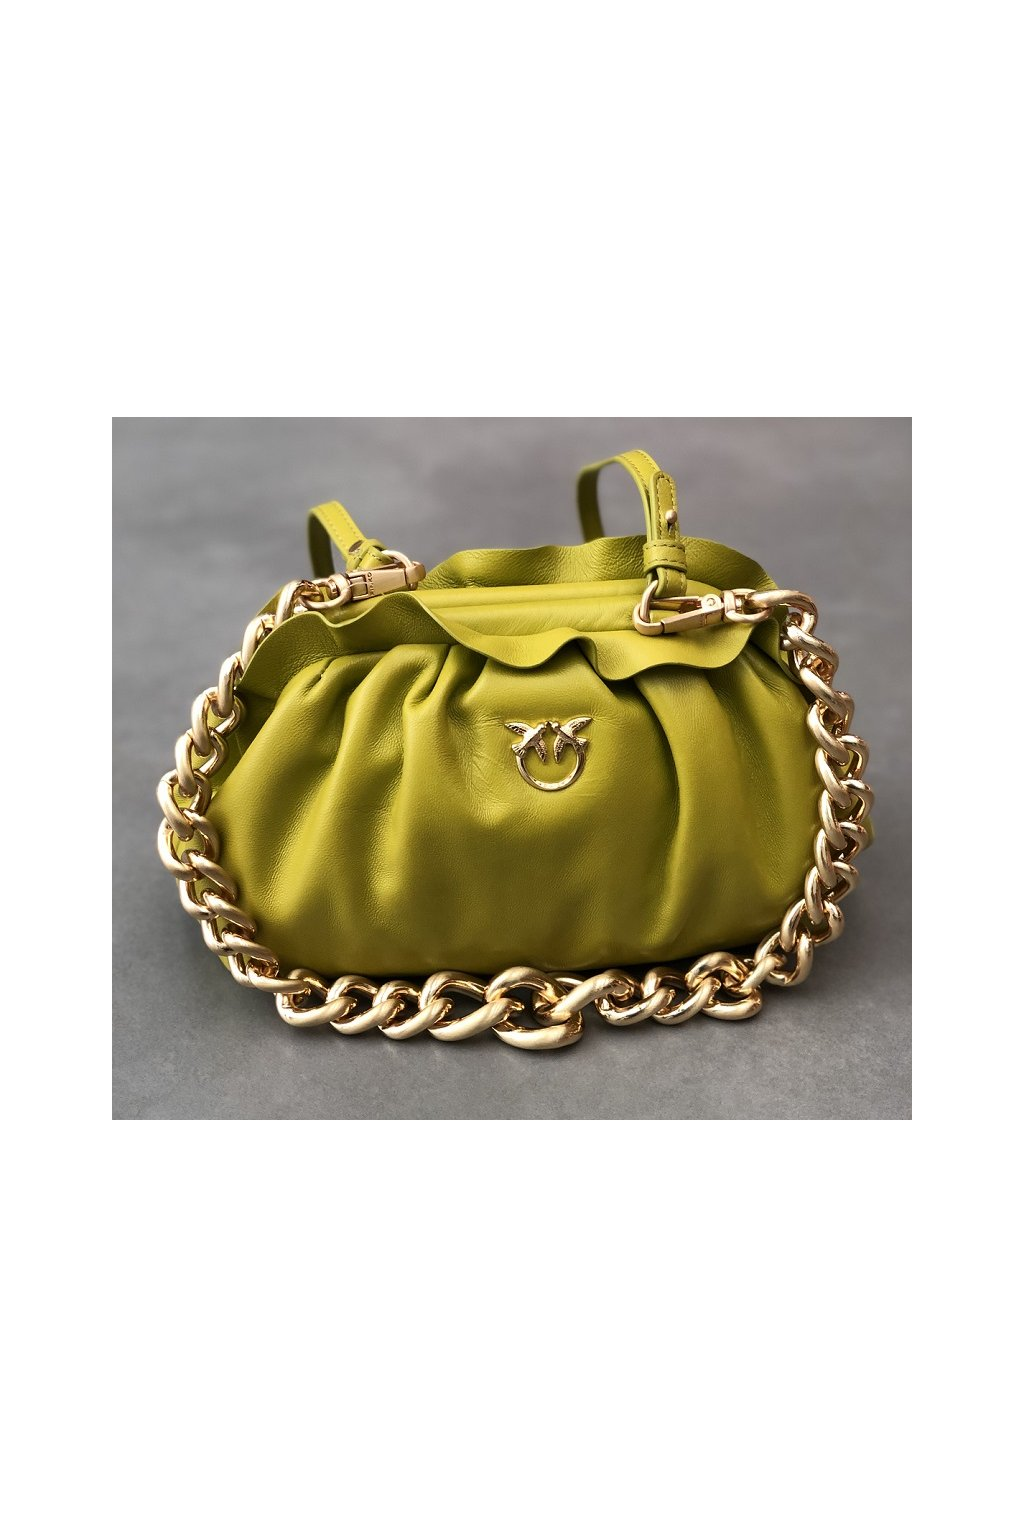 1P2236 Y6Y8 T56 Dámská kabelka Pinko Mini Chain Clutch Fraimed Chain C zelená